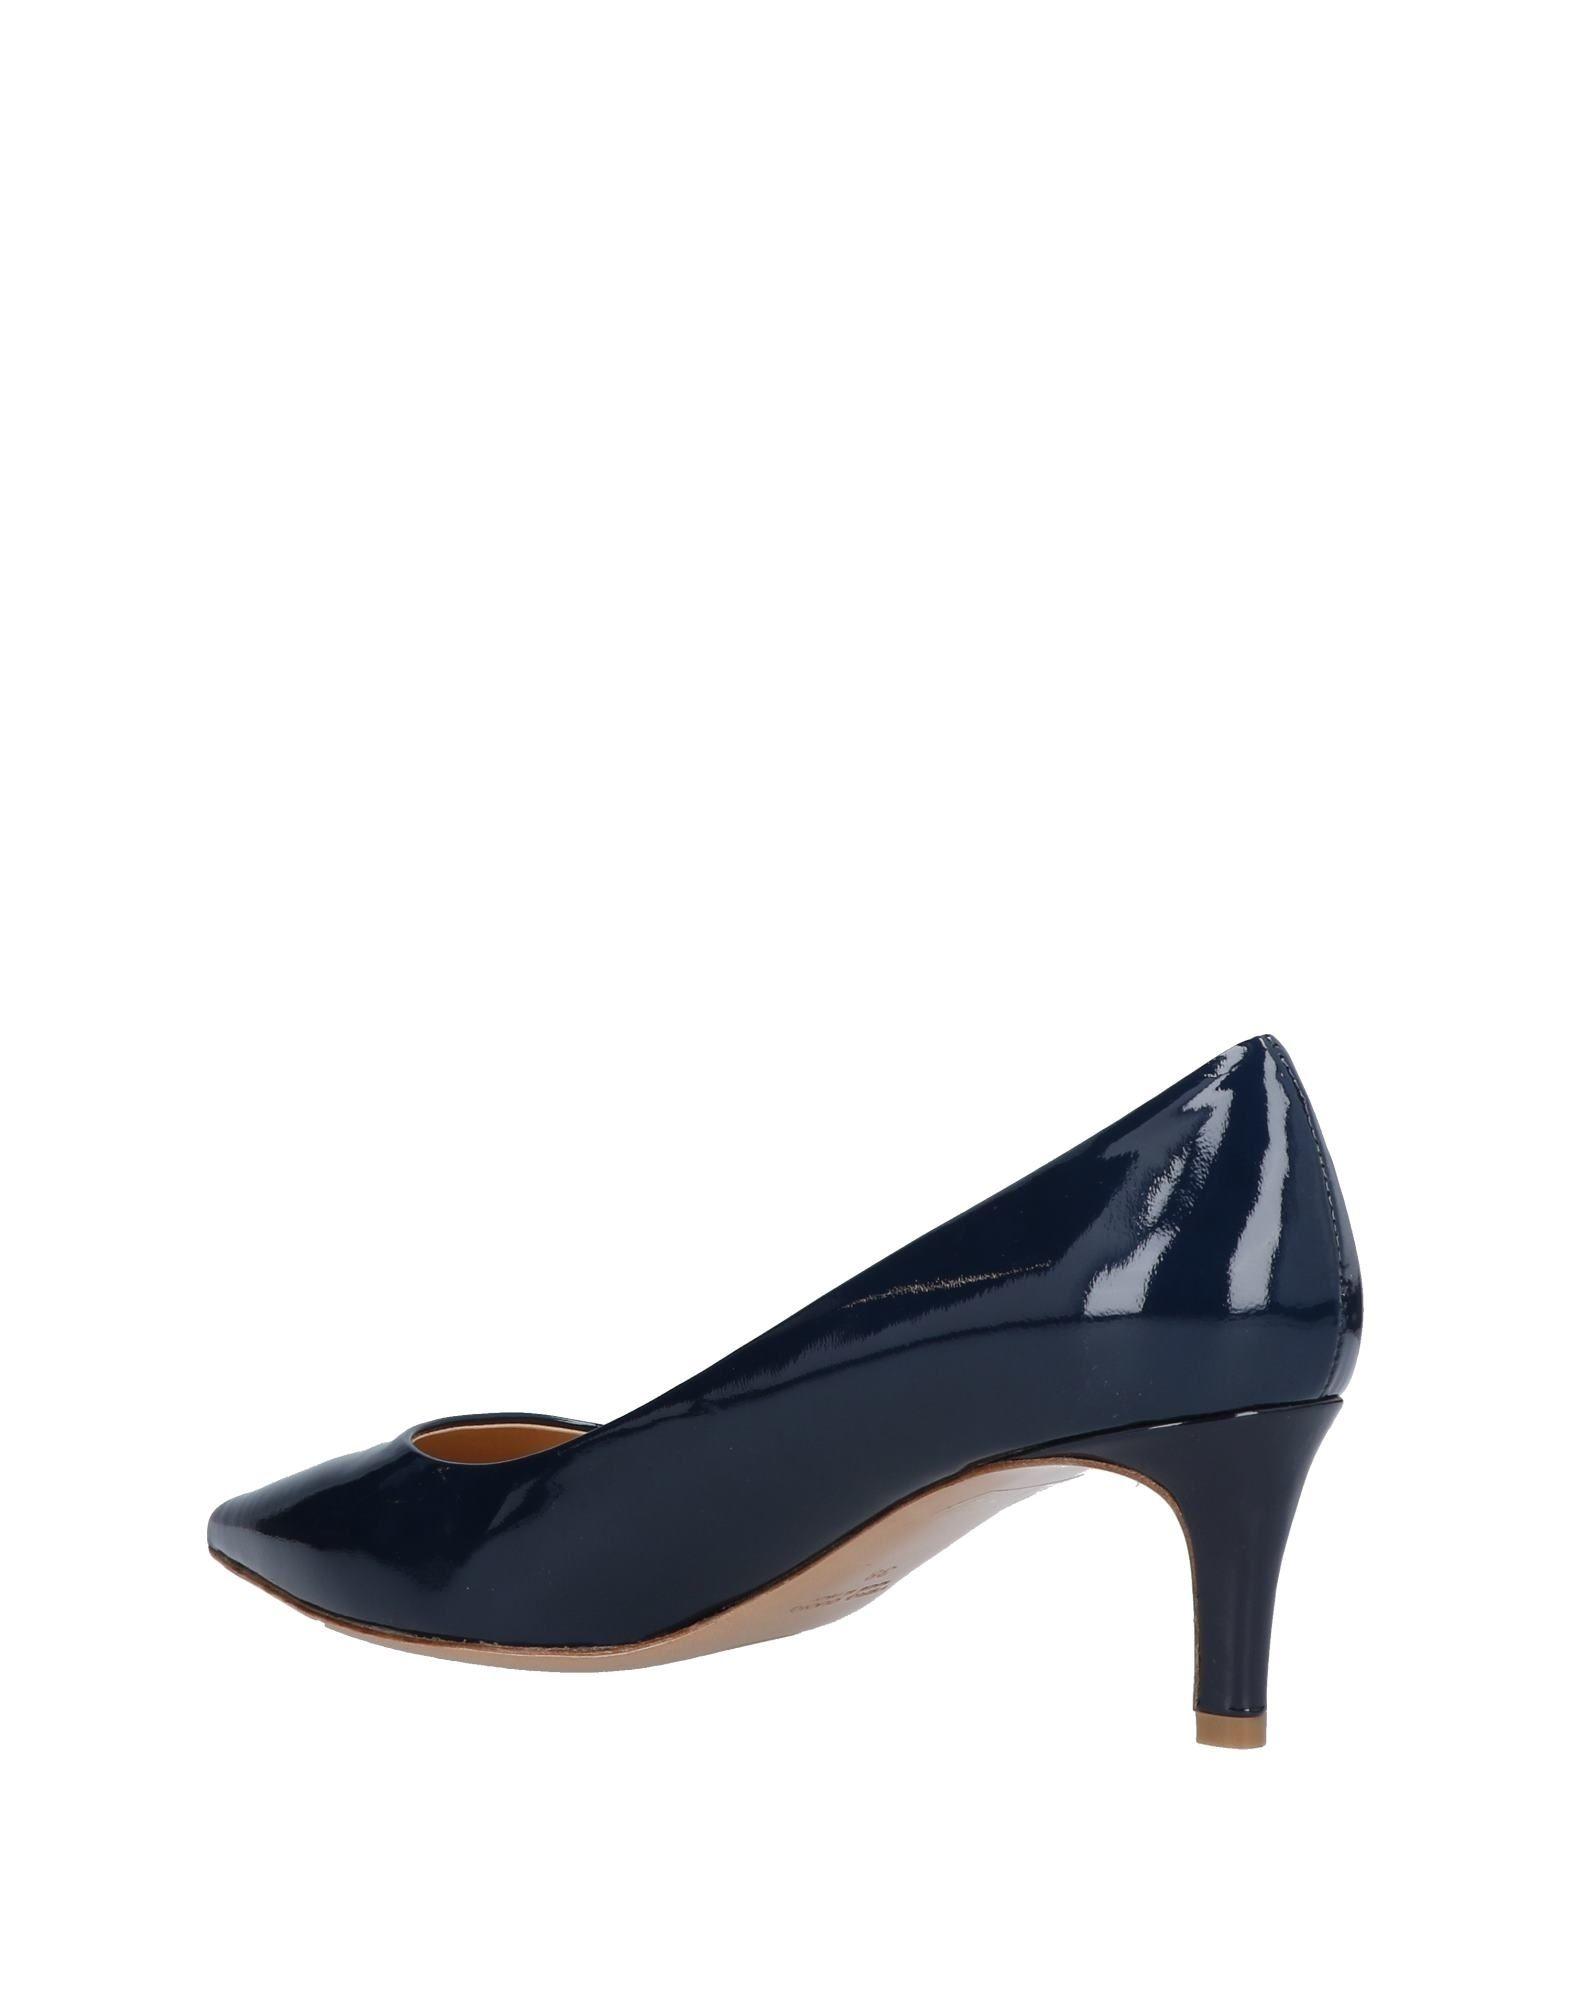 Gut um Pumps billige Schuhe zu tragenMi Amor Pumps um Damen  11459794WR ada407